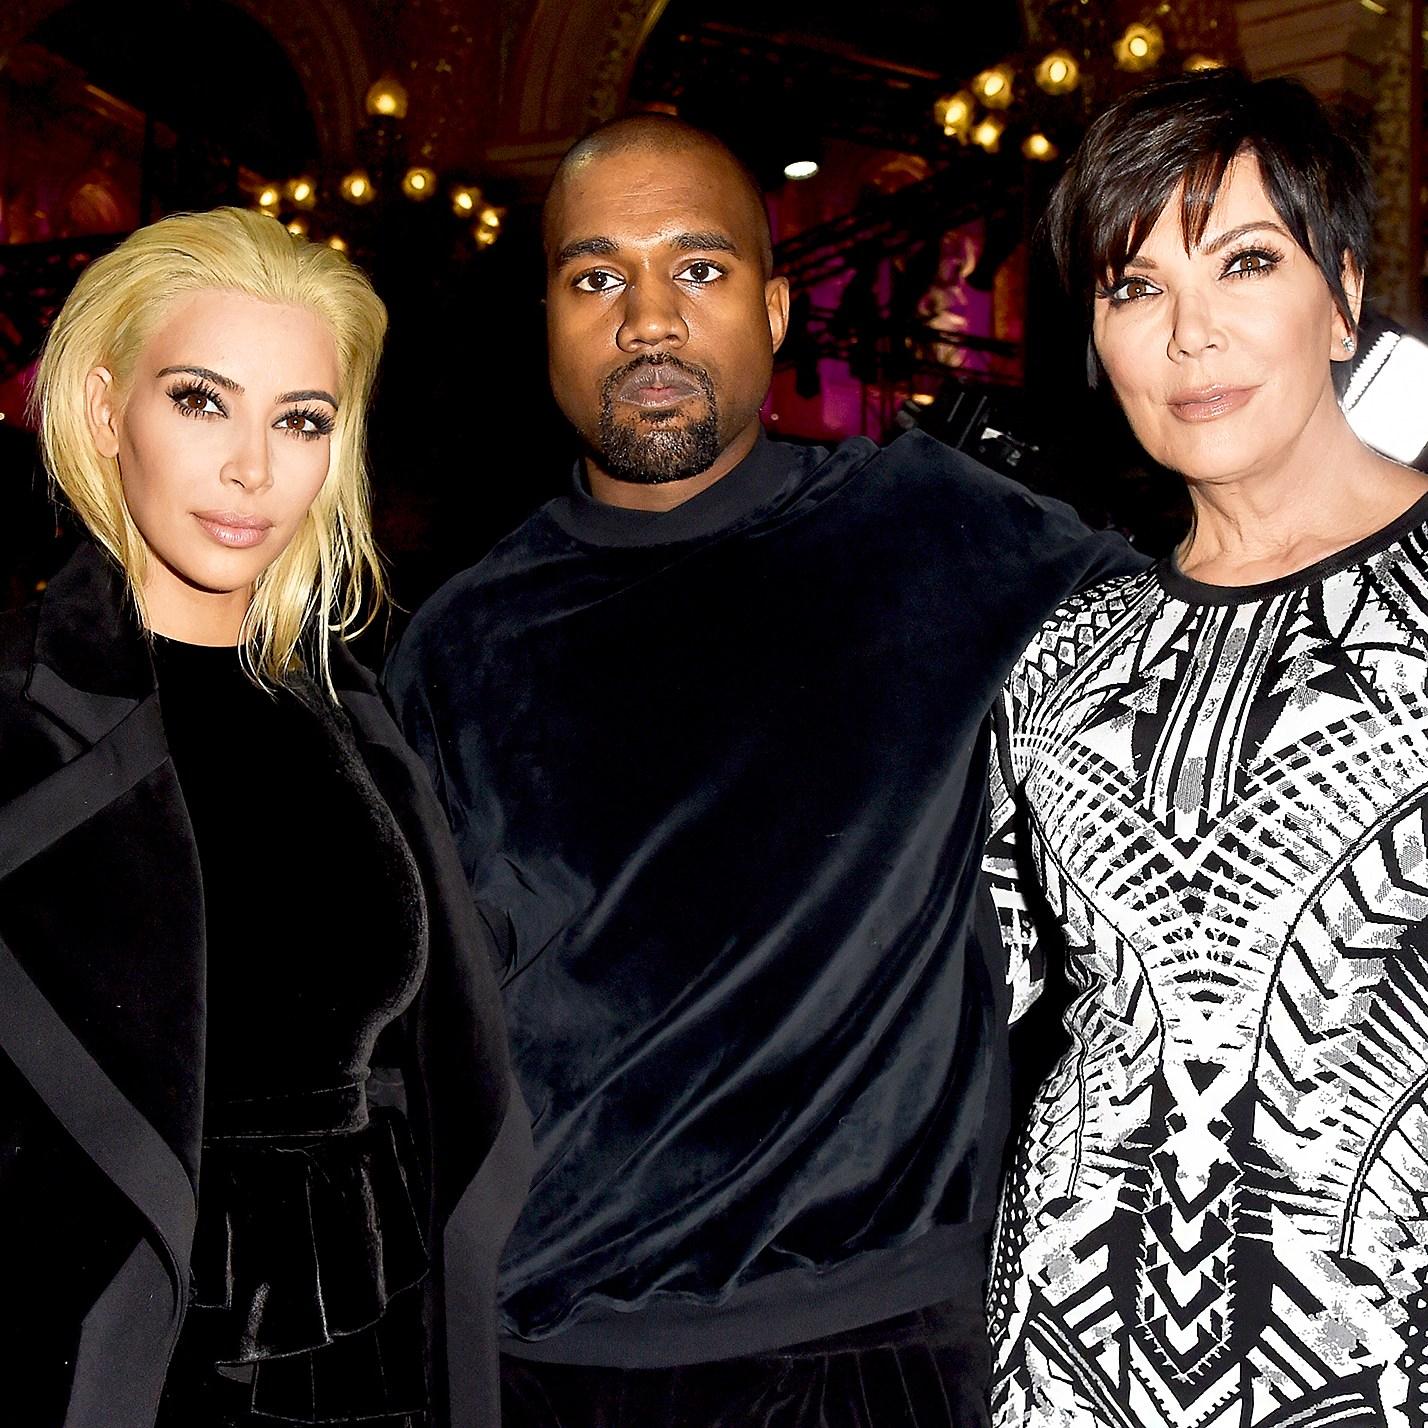 Kim Kardashian, Kanye West and Kris Jenner attend the Balmain show during Paris Fashion Week Womenswear Fall/Winter 2015/2016 in Paris, France.